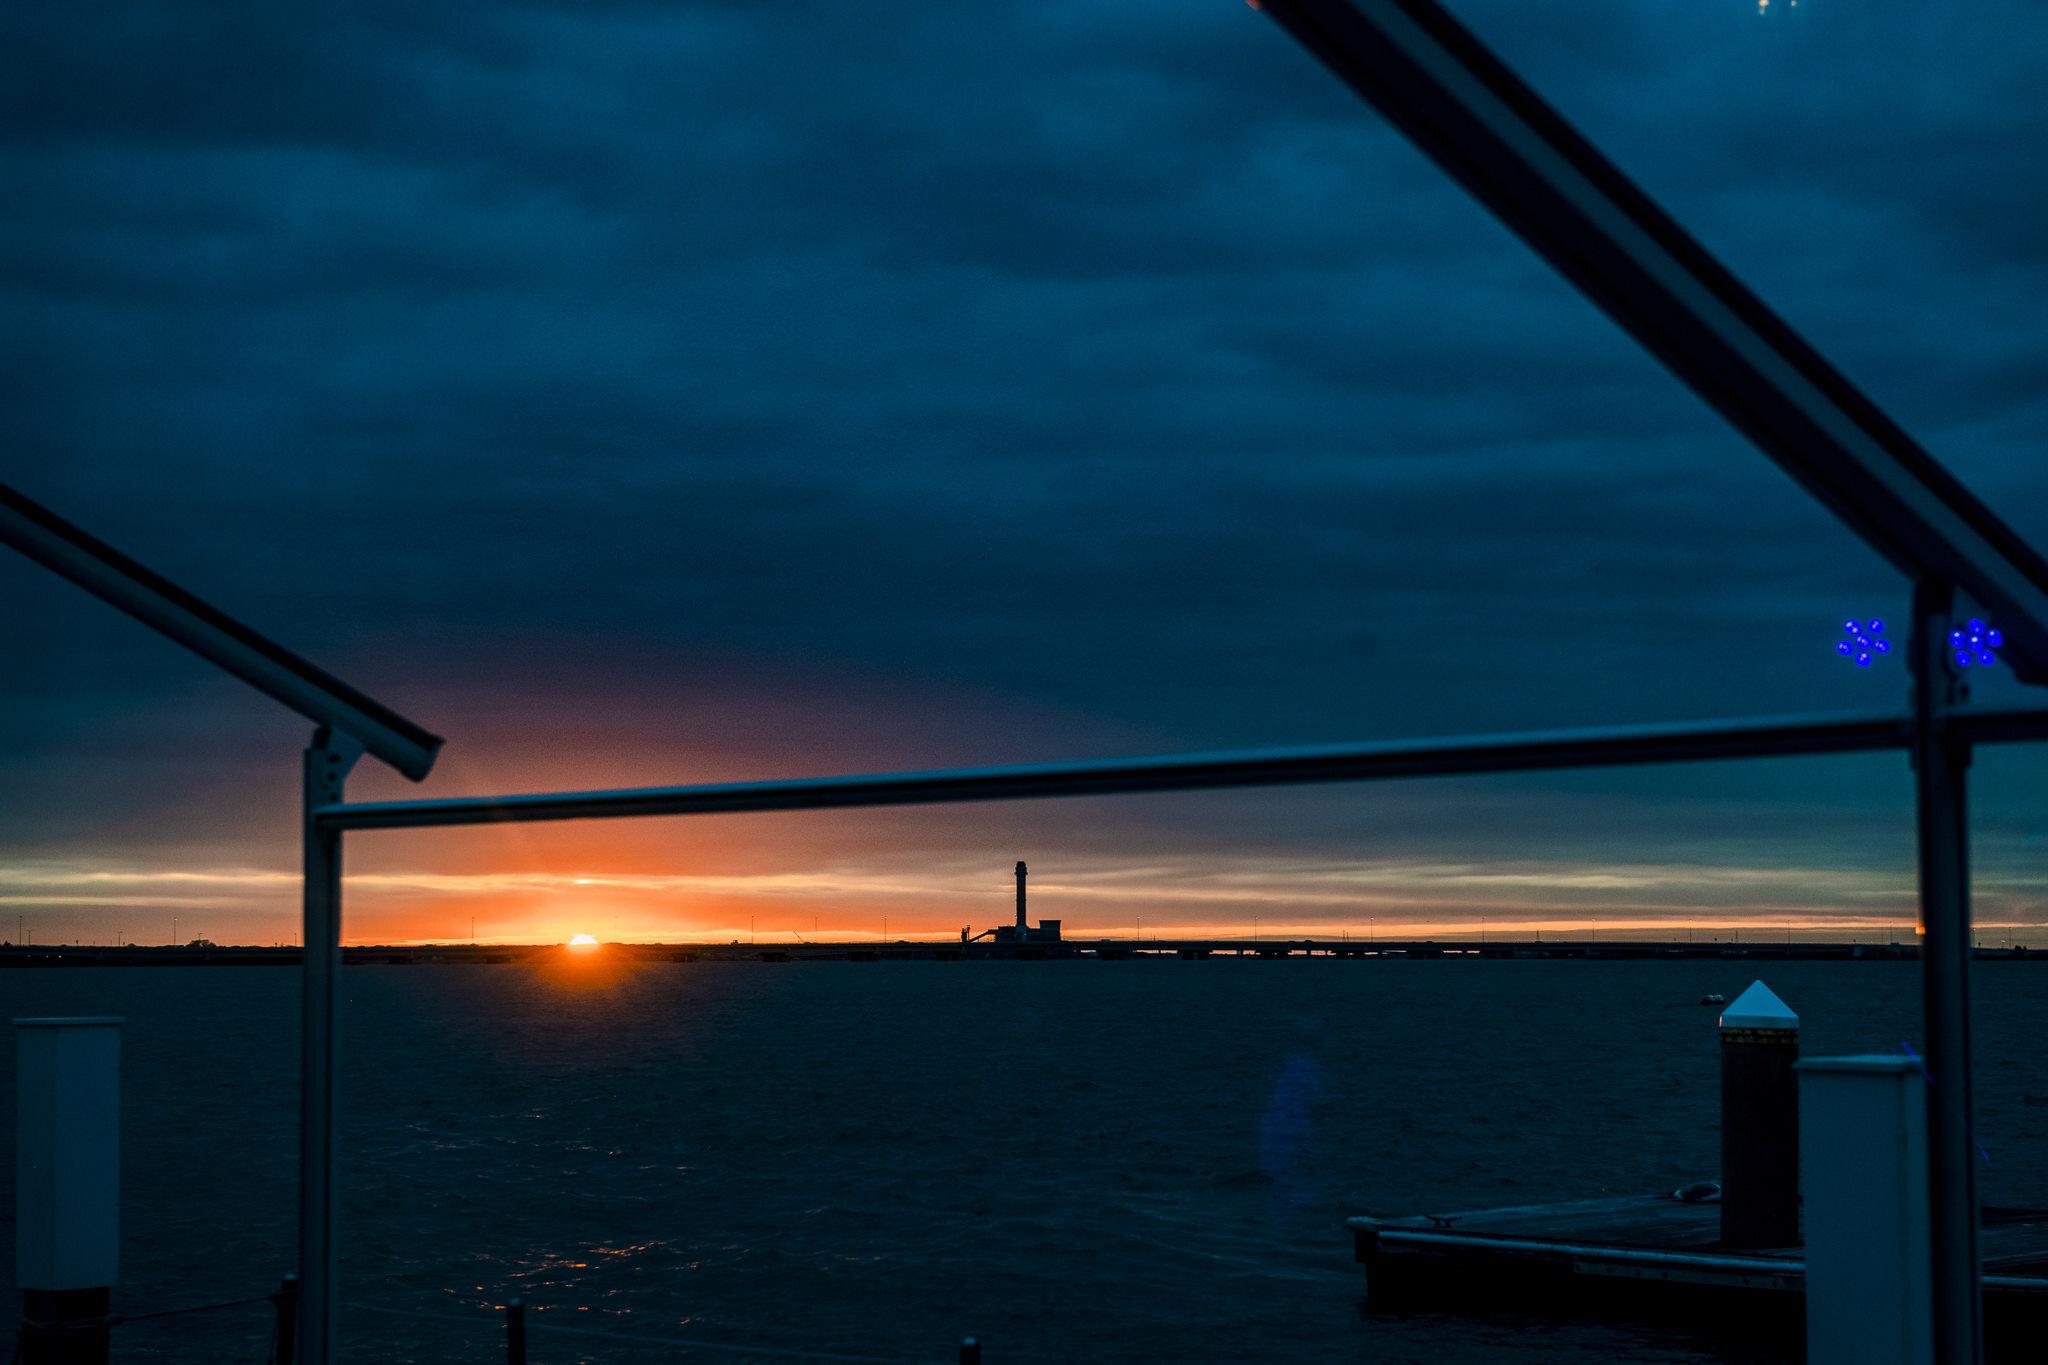 Snell-Ocean-City-Yacht-Club-New-Jersey-Wedding-Photographer-23.JPG